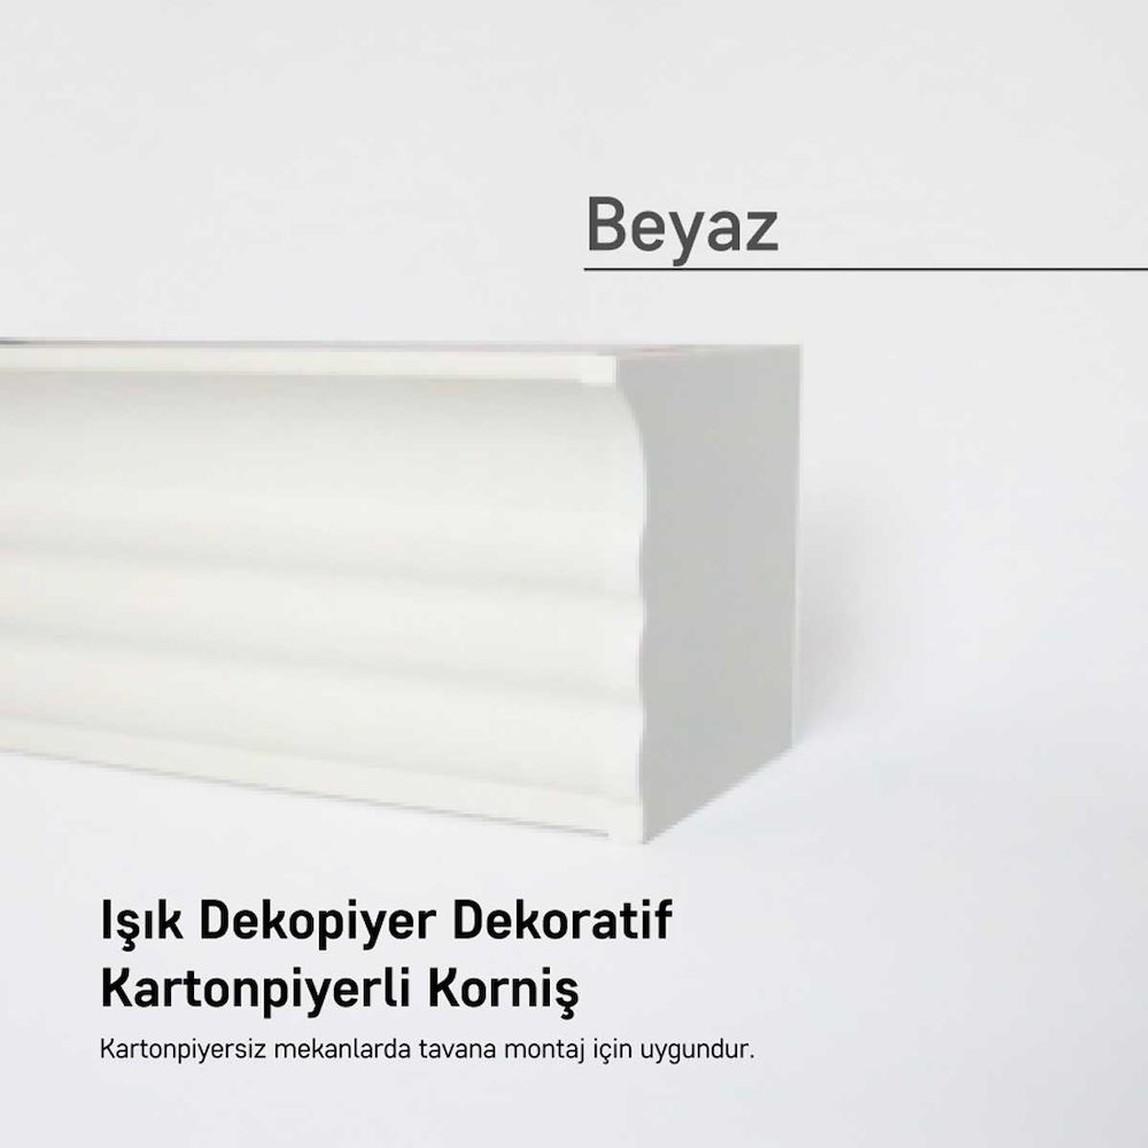 Panolu Pvc Perde Rayı Beyaz 300 cm